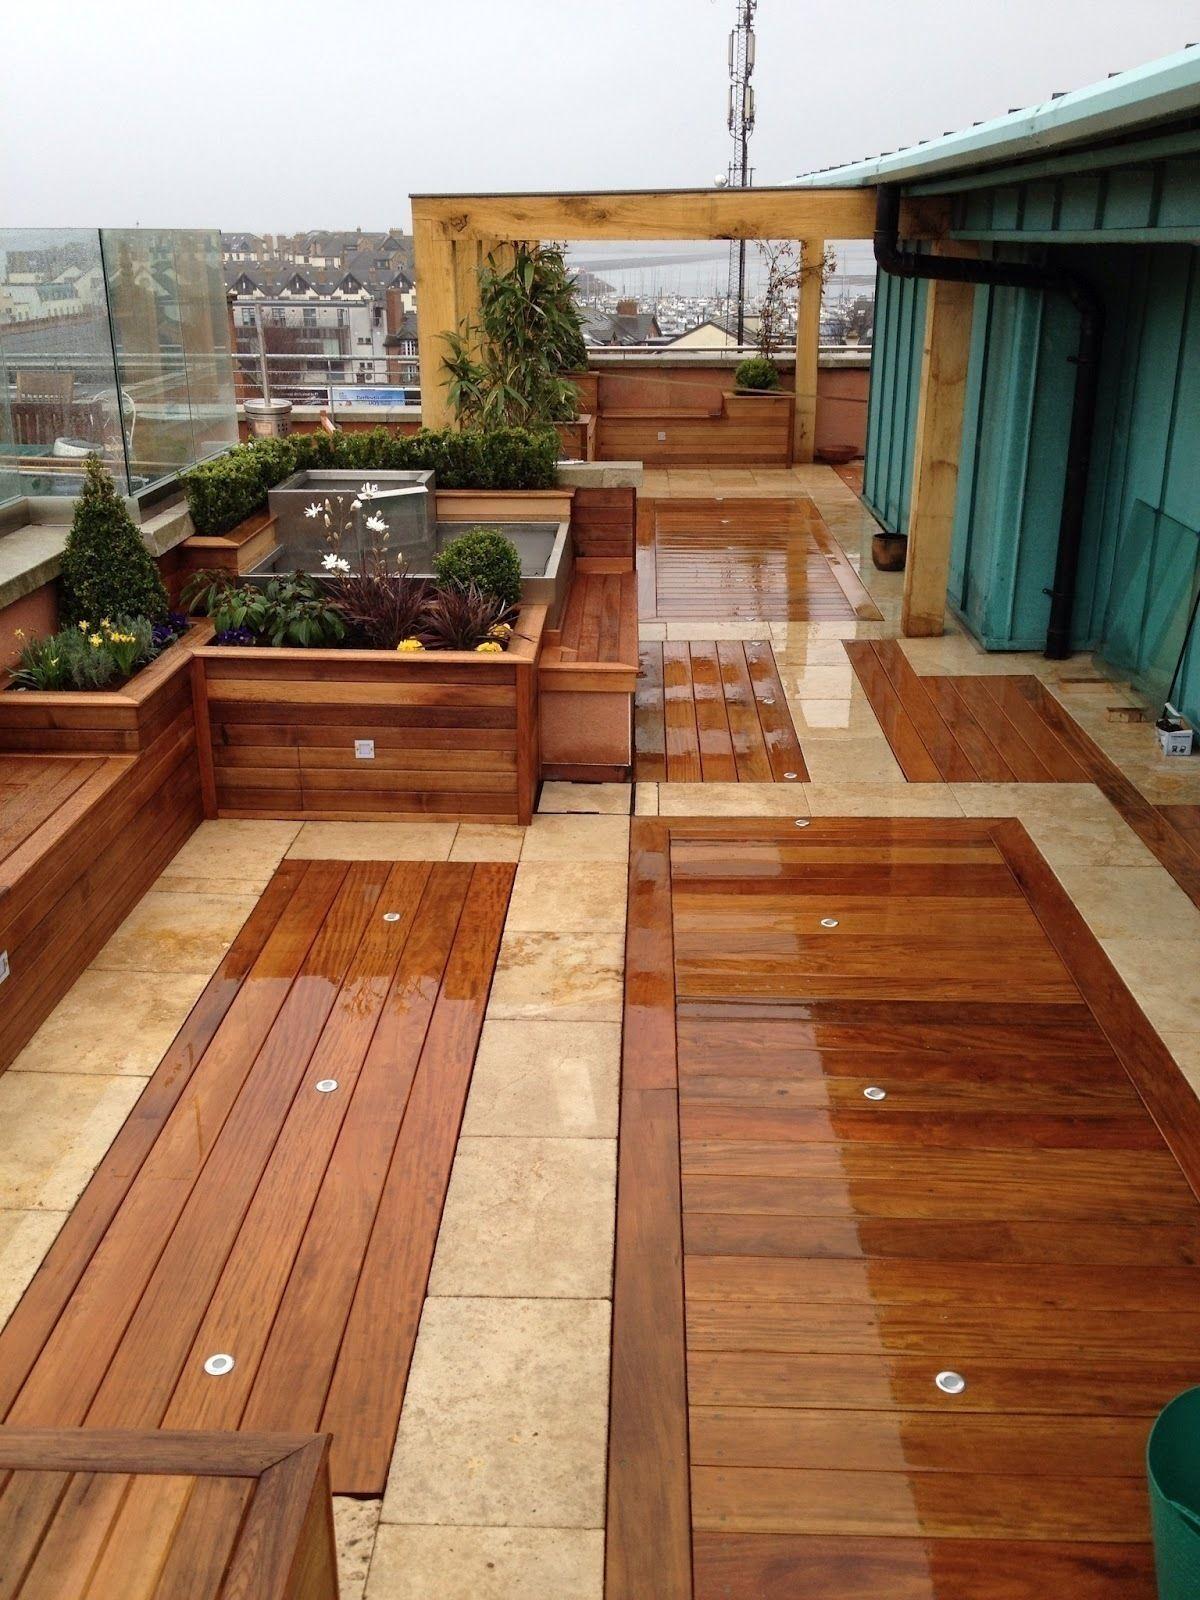 Bezaubernde Dach Garten Ideen #Badezimmer #Büromöbel #Couchtisch #Deko Ideen  #Gartenmöbel #